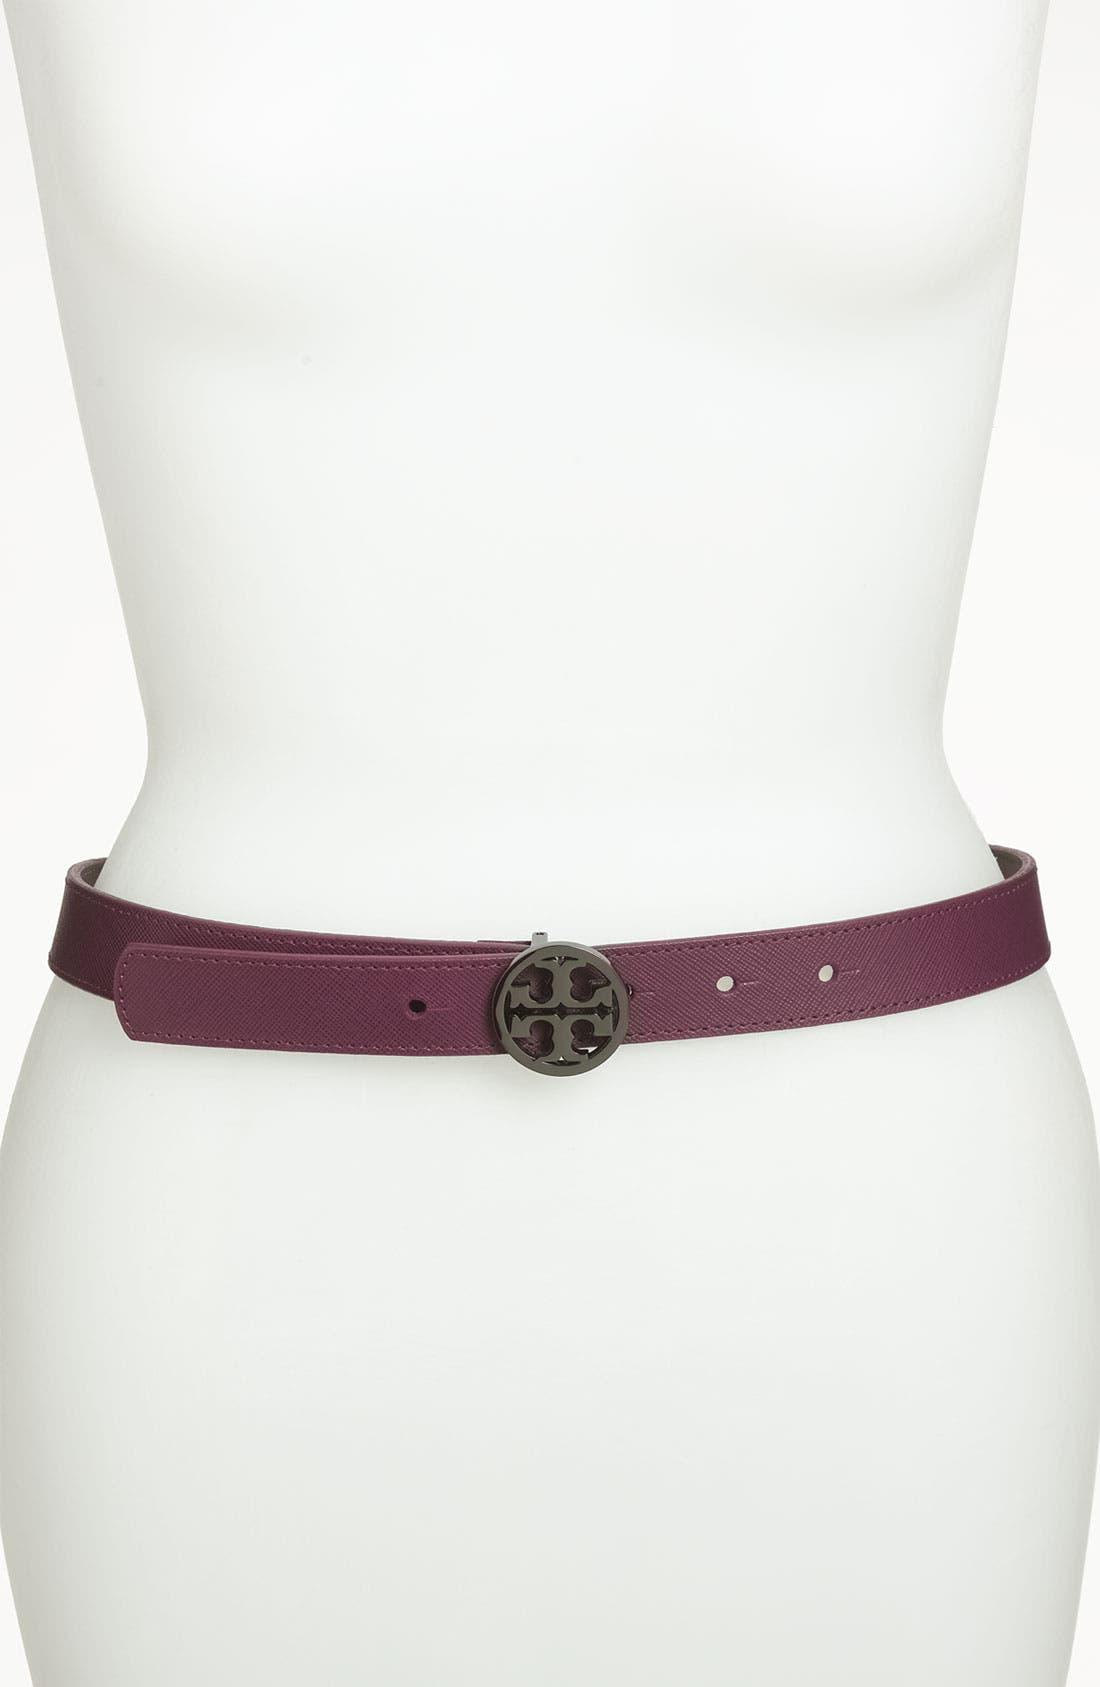 Main Image - Tory Burch 'Classic Tory Logo' Saffiano Leather Belt